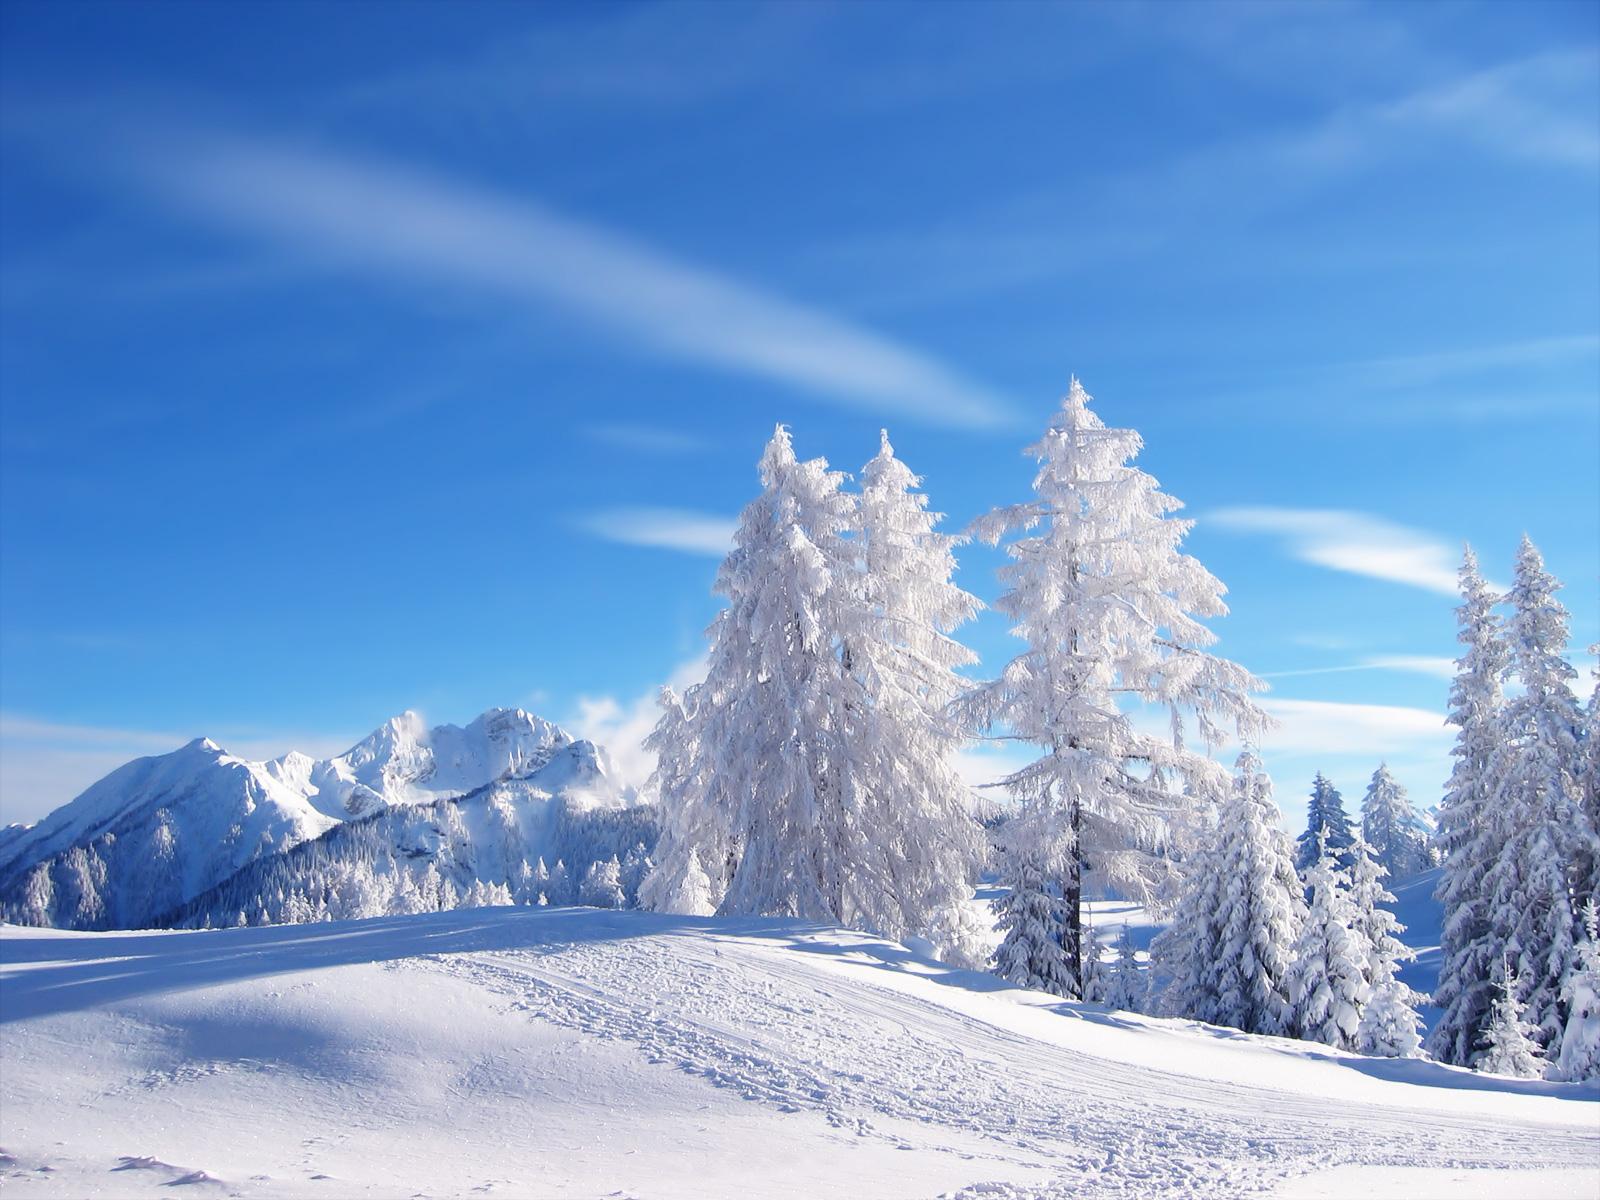 Winter Wallpapers HD 1600x1200